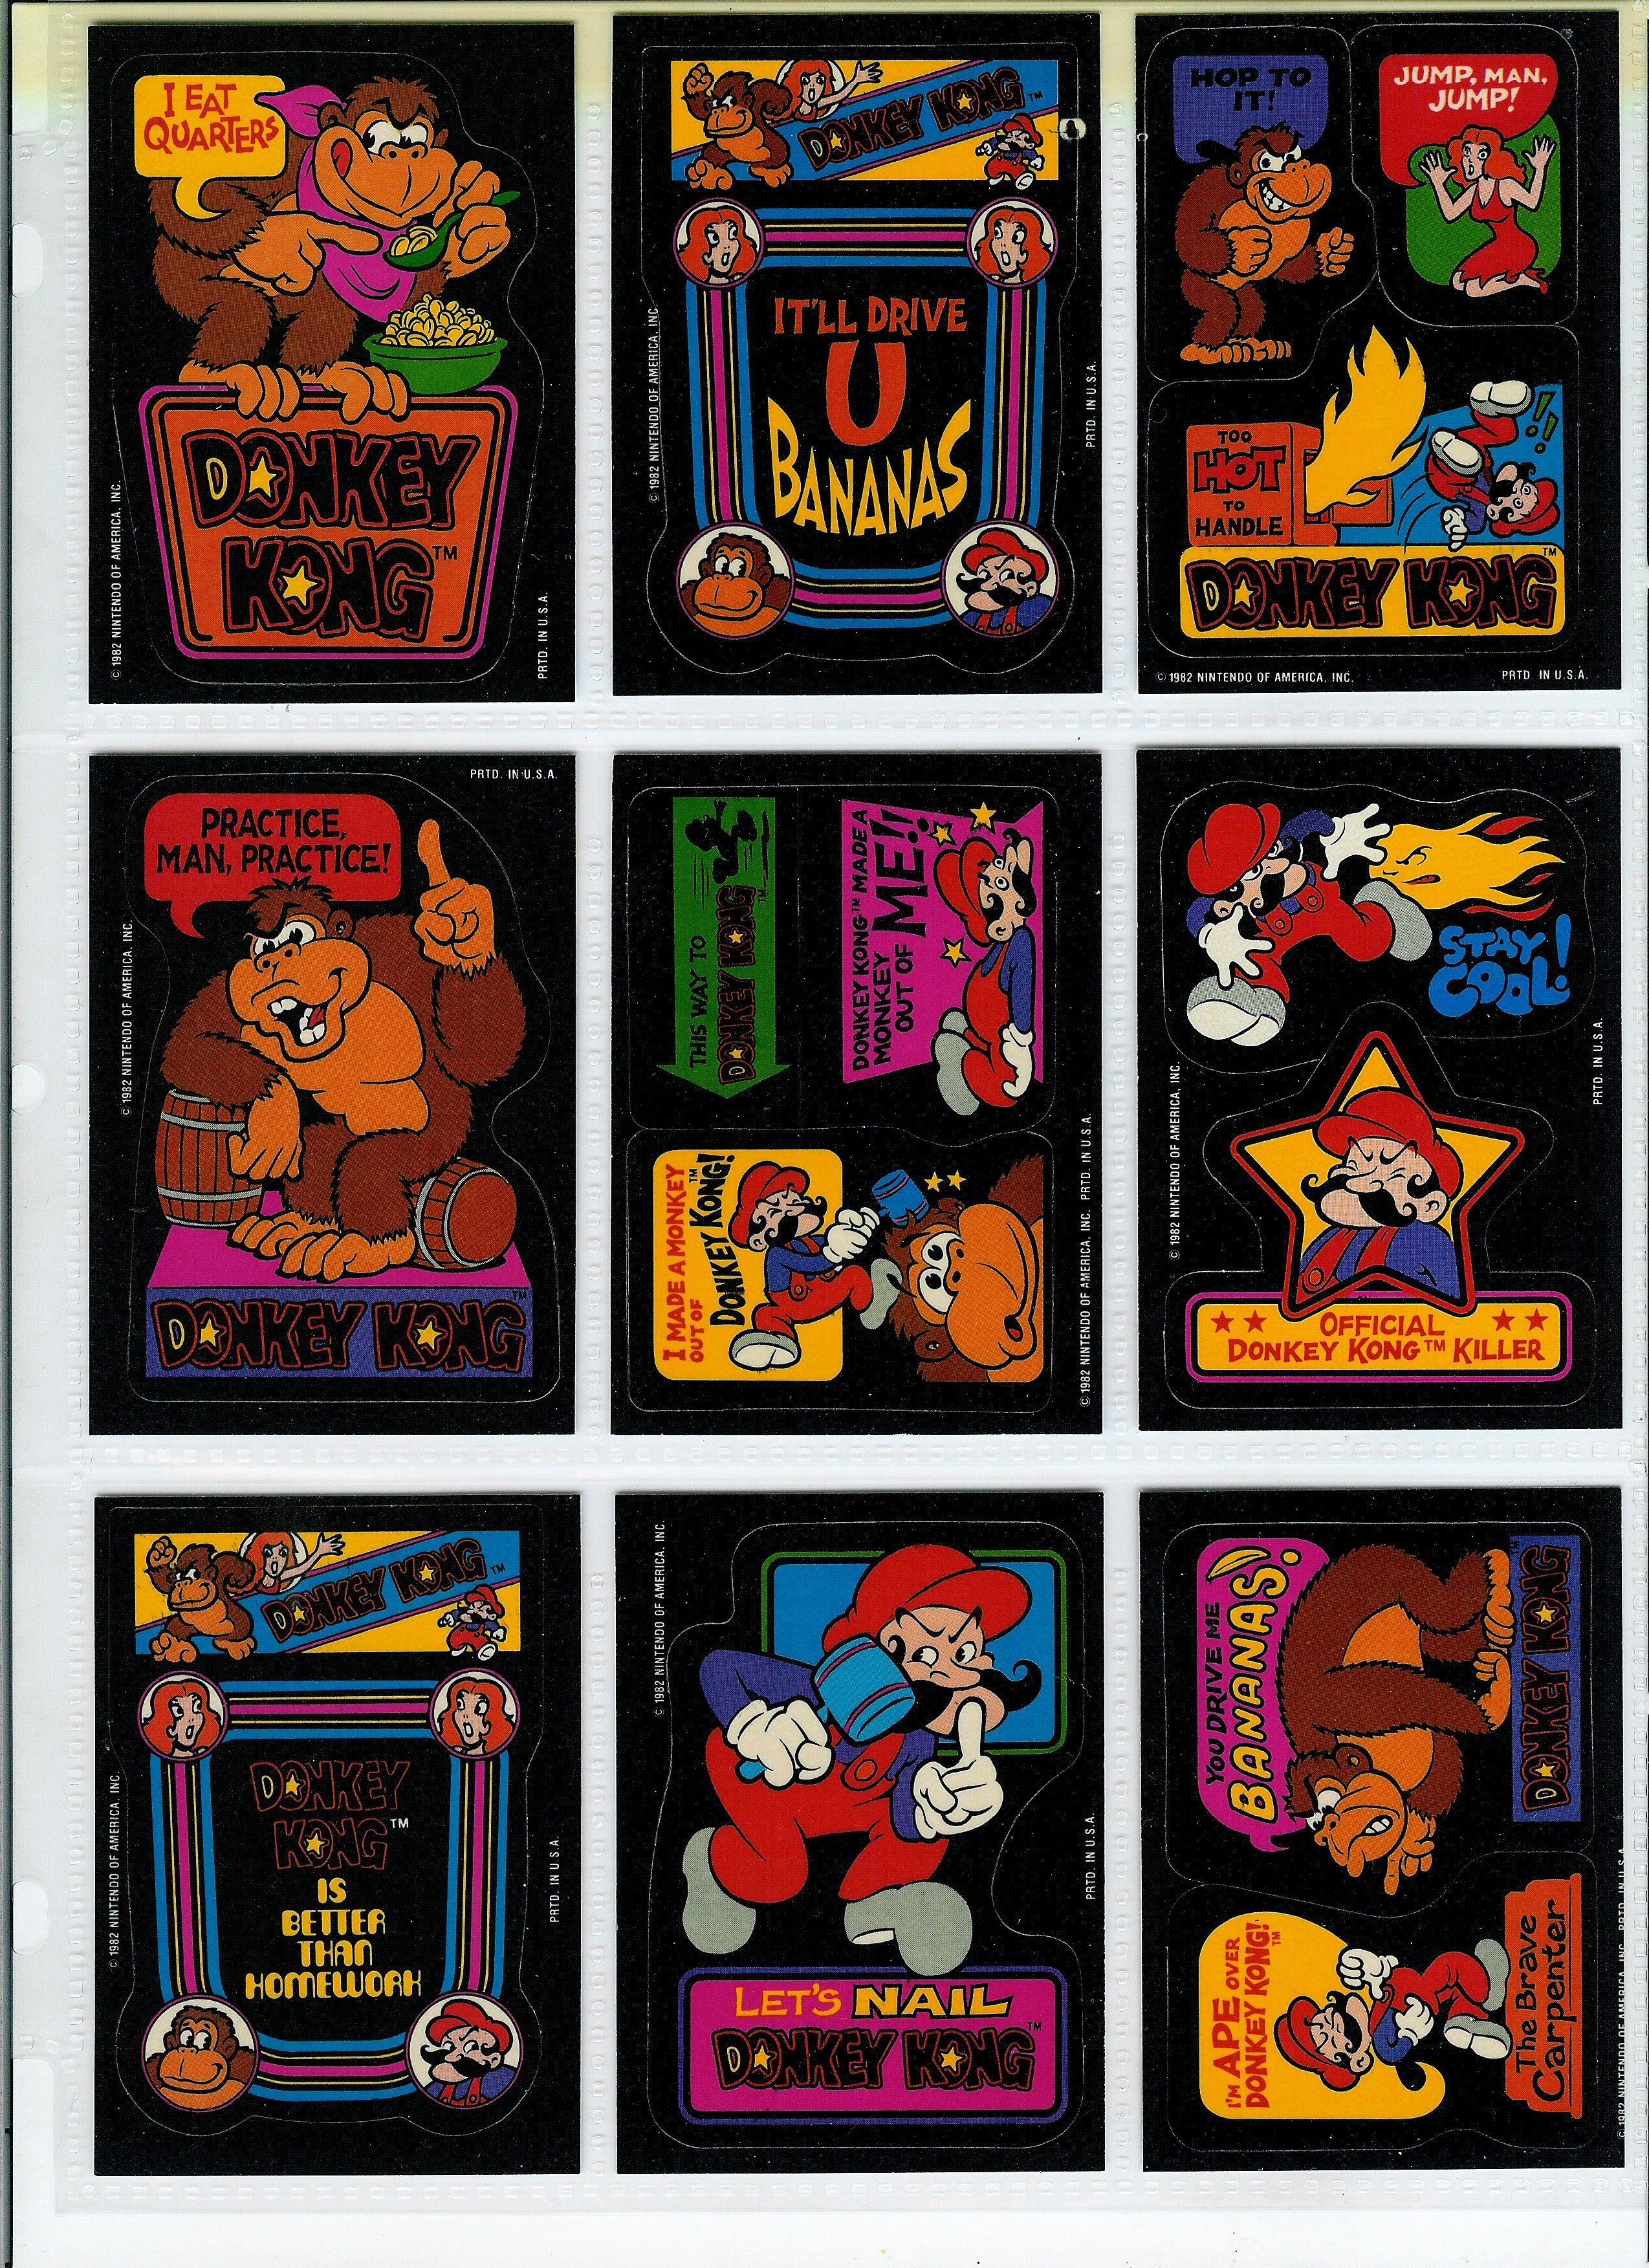 donkeykongcards31.jpg 2,549×3,506 pixels Sticker album